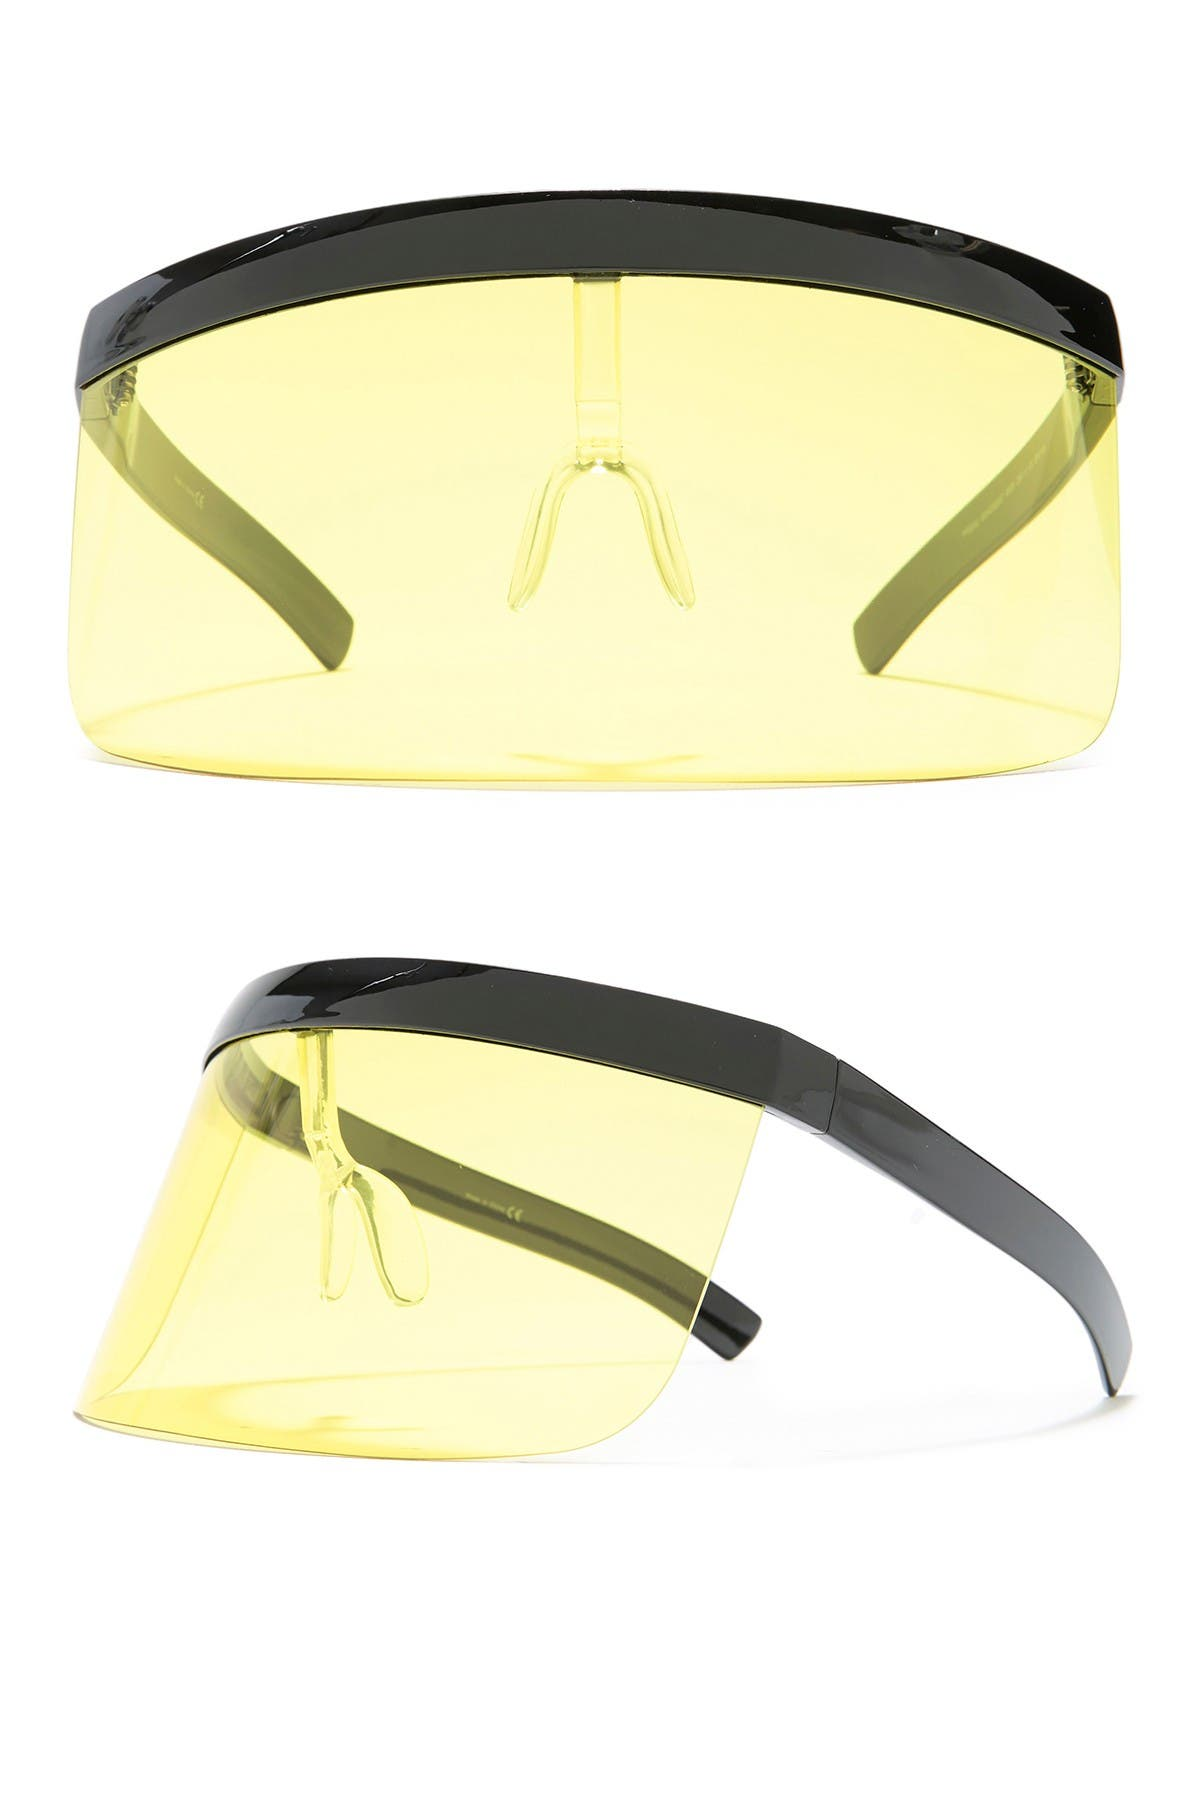 Image of Details Eyewear Personal Protective Eye Shield - Black/Yellow